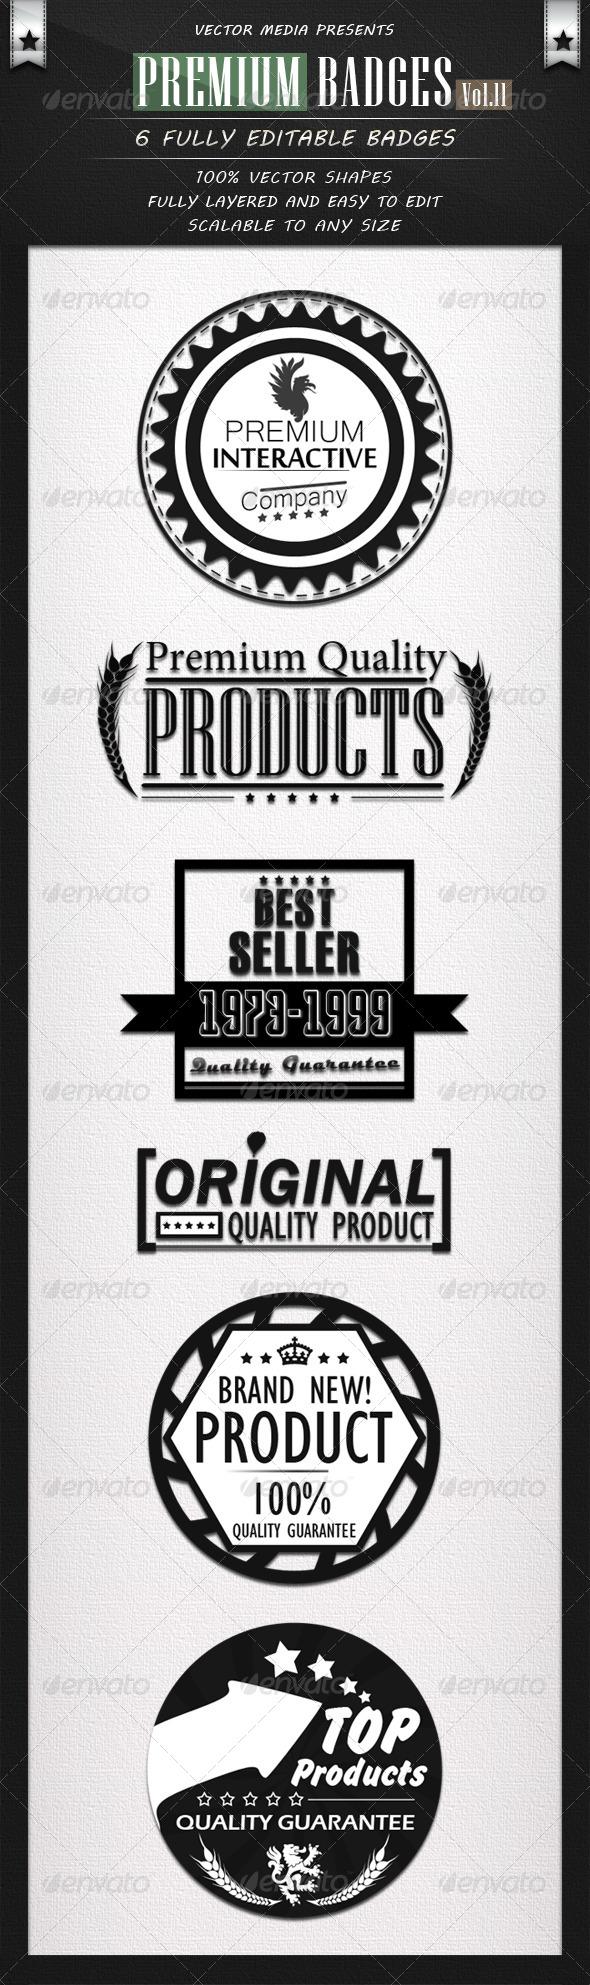 Premium Badges - Vol.11 - Badges & Stickers Web Elements